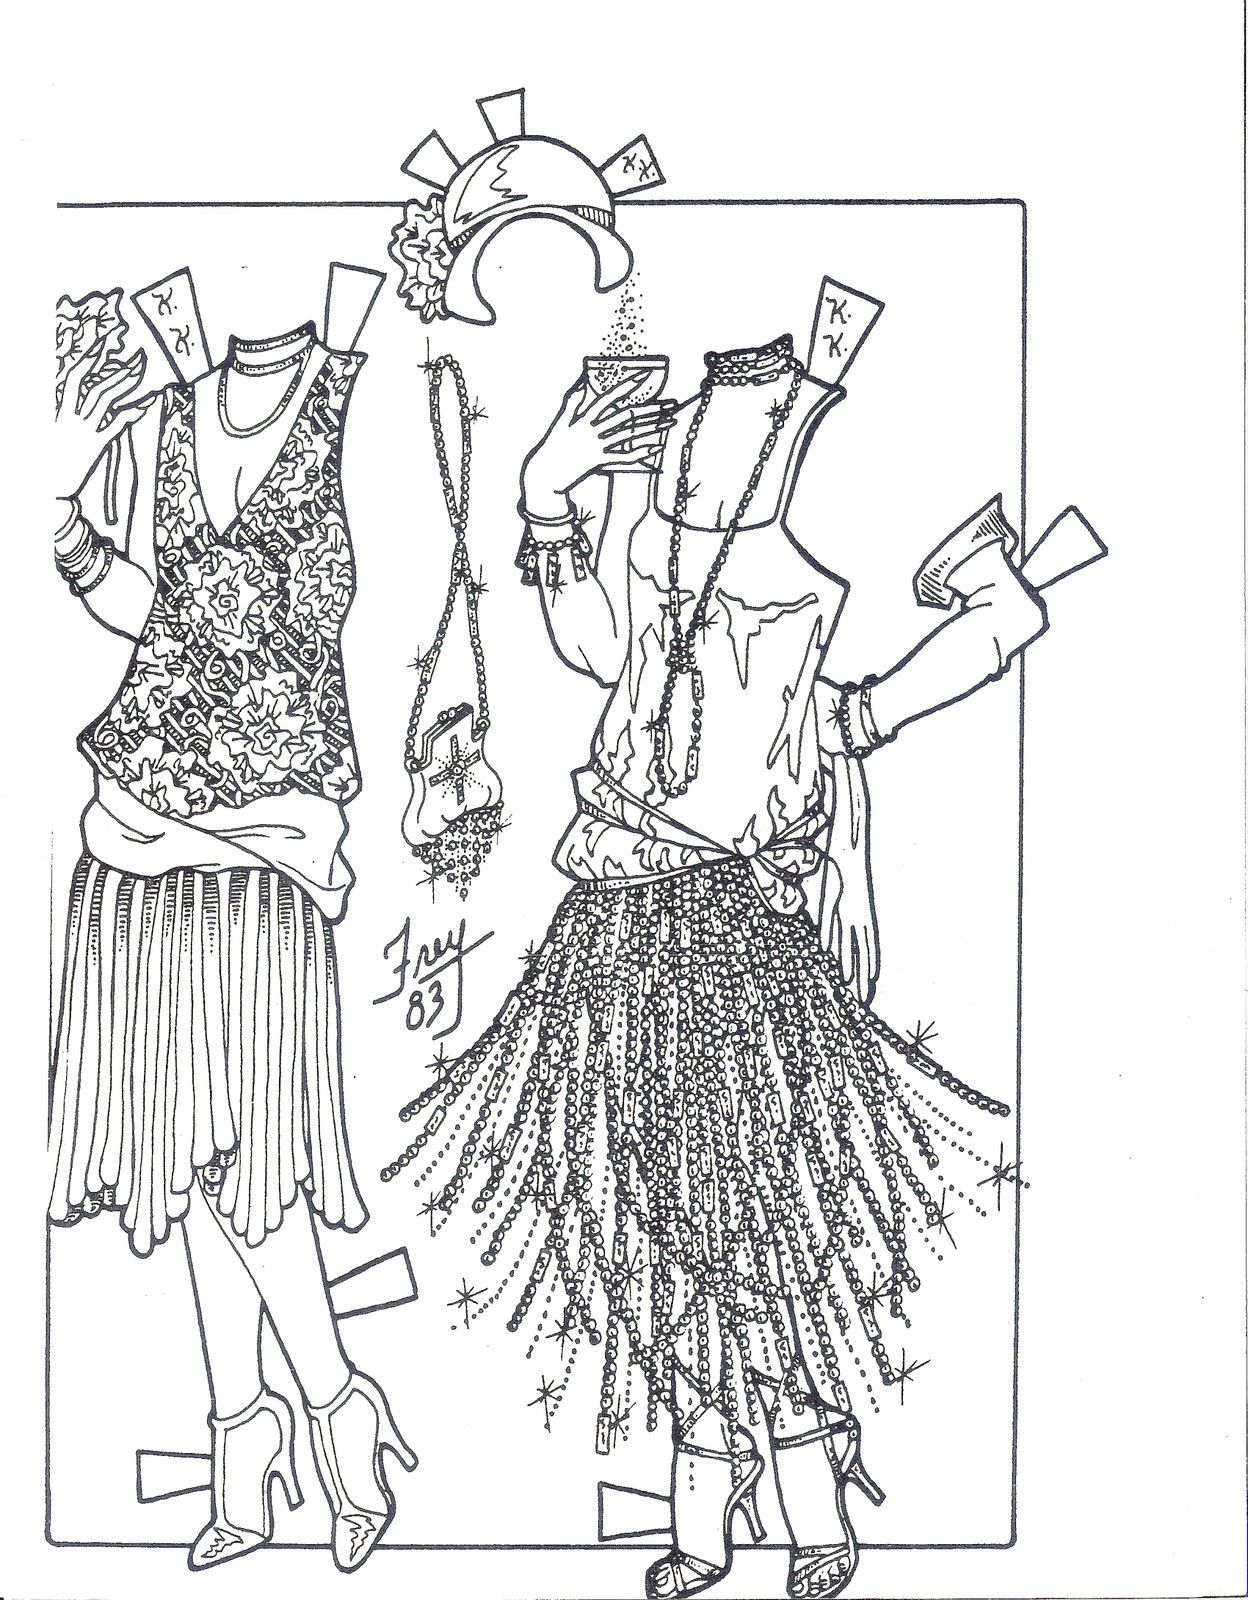 2 katy keene fashions of the 1920 u0026 39 s 1983 paper doll sheets